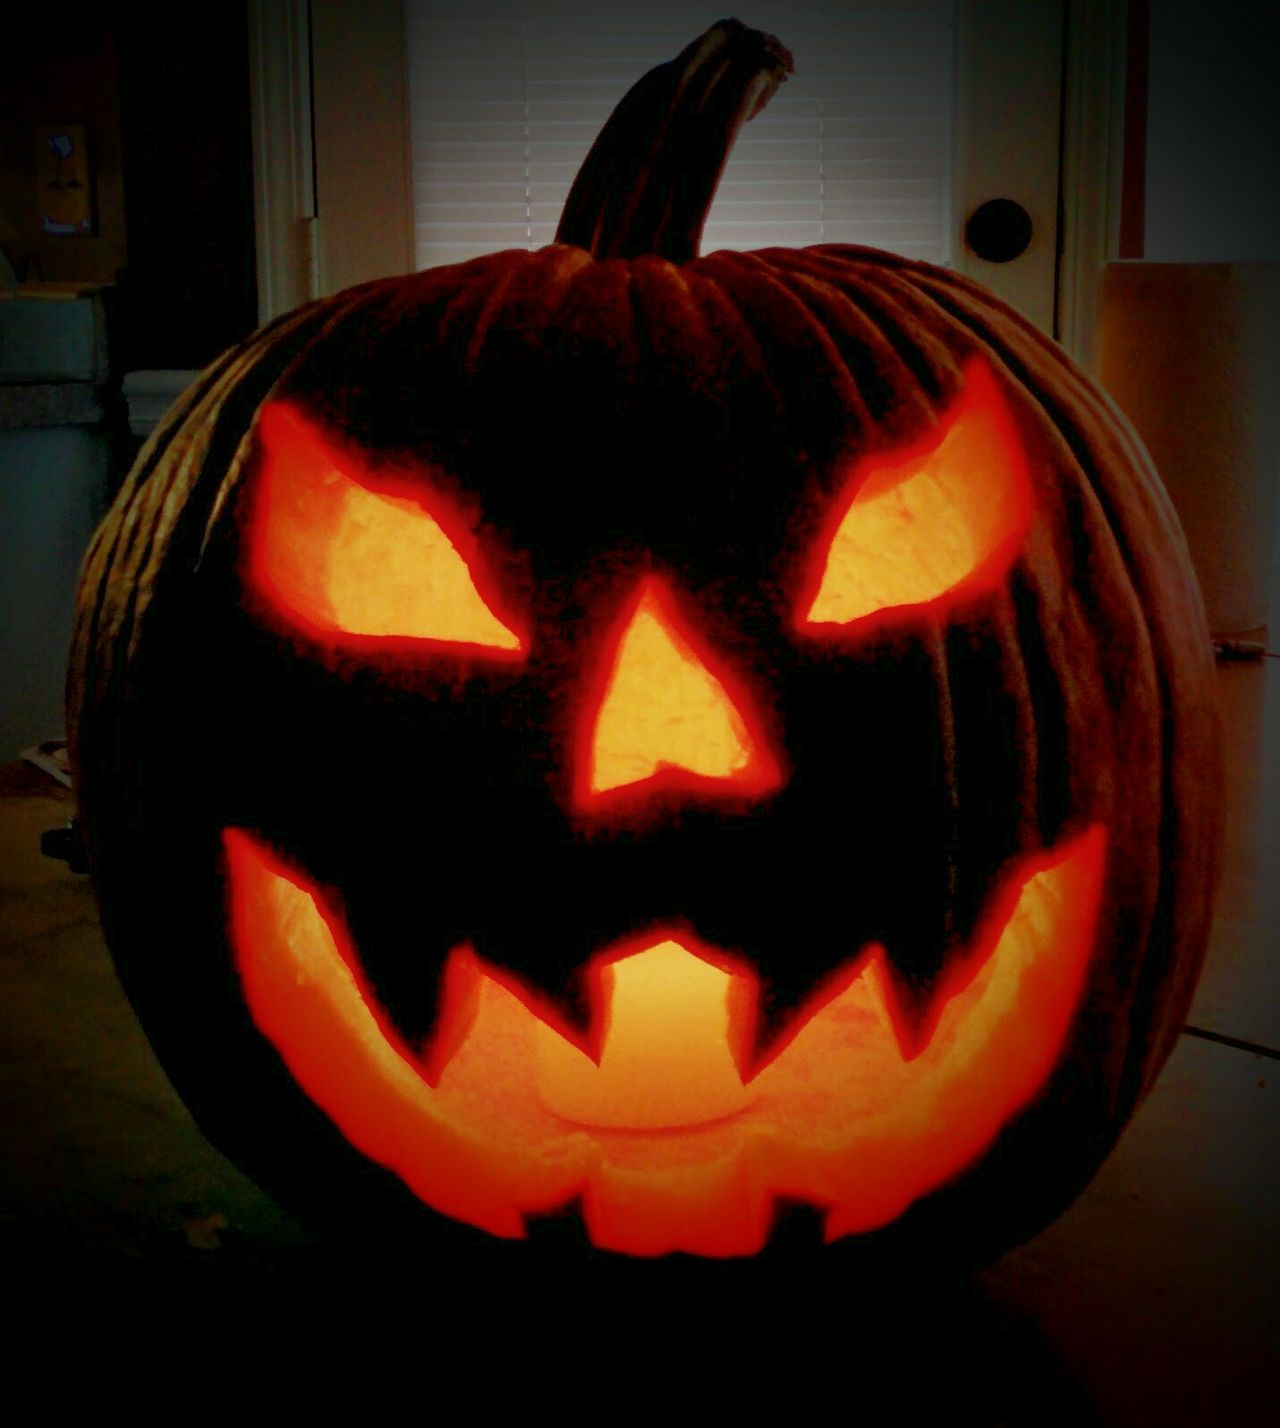 Jackolantern Halloween Pumpkin Smile Toothy Smile Jack-o-lantern Candlelight Allhallowseve Orange Guildwars2